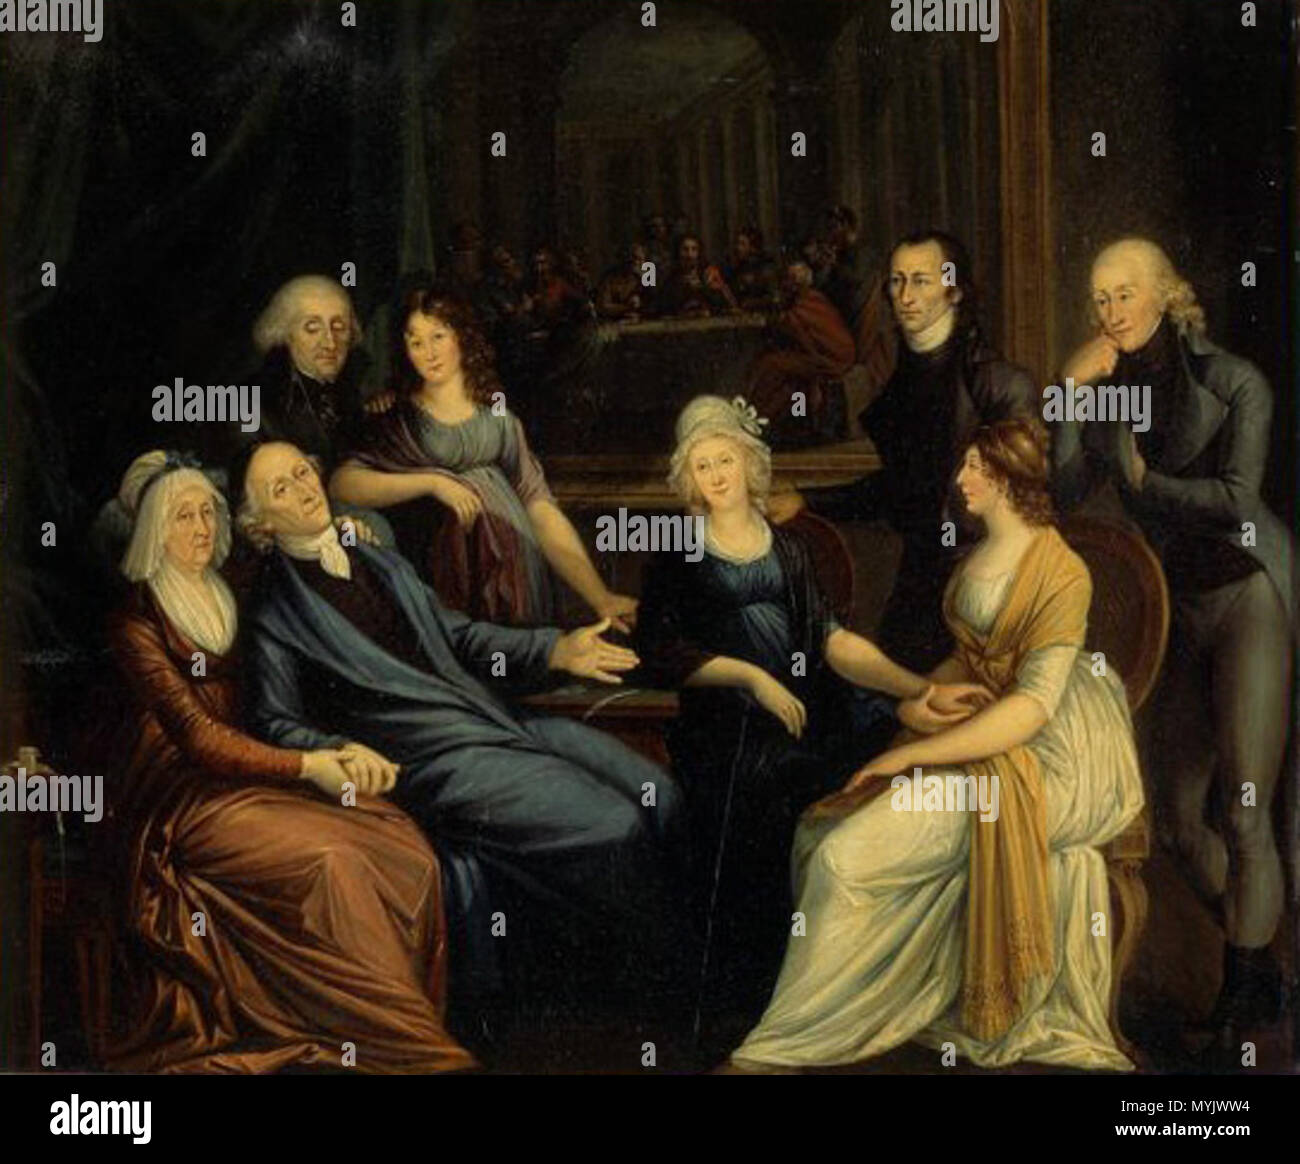 . Lavaters Tod, die Familie ist am Berchtoldstag 1801 um den sterbenden Lavater versammelt. c. 1801-1825 314 Lavaters Tod - Stock Image